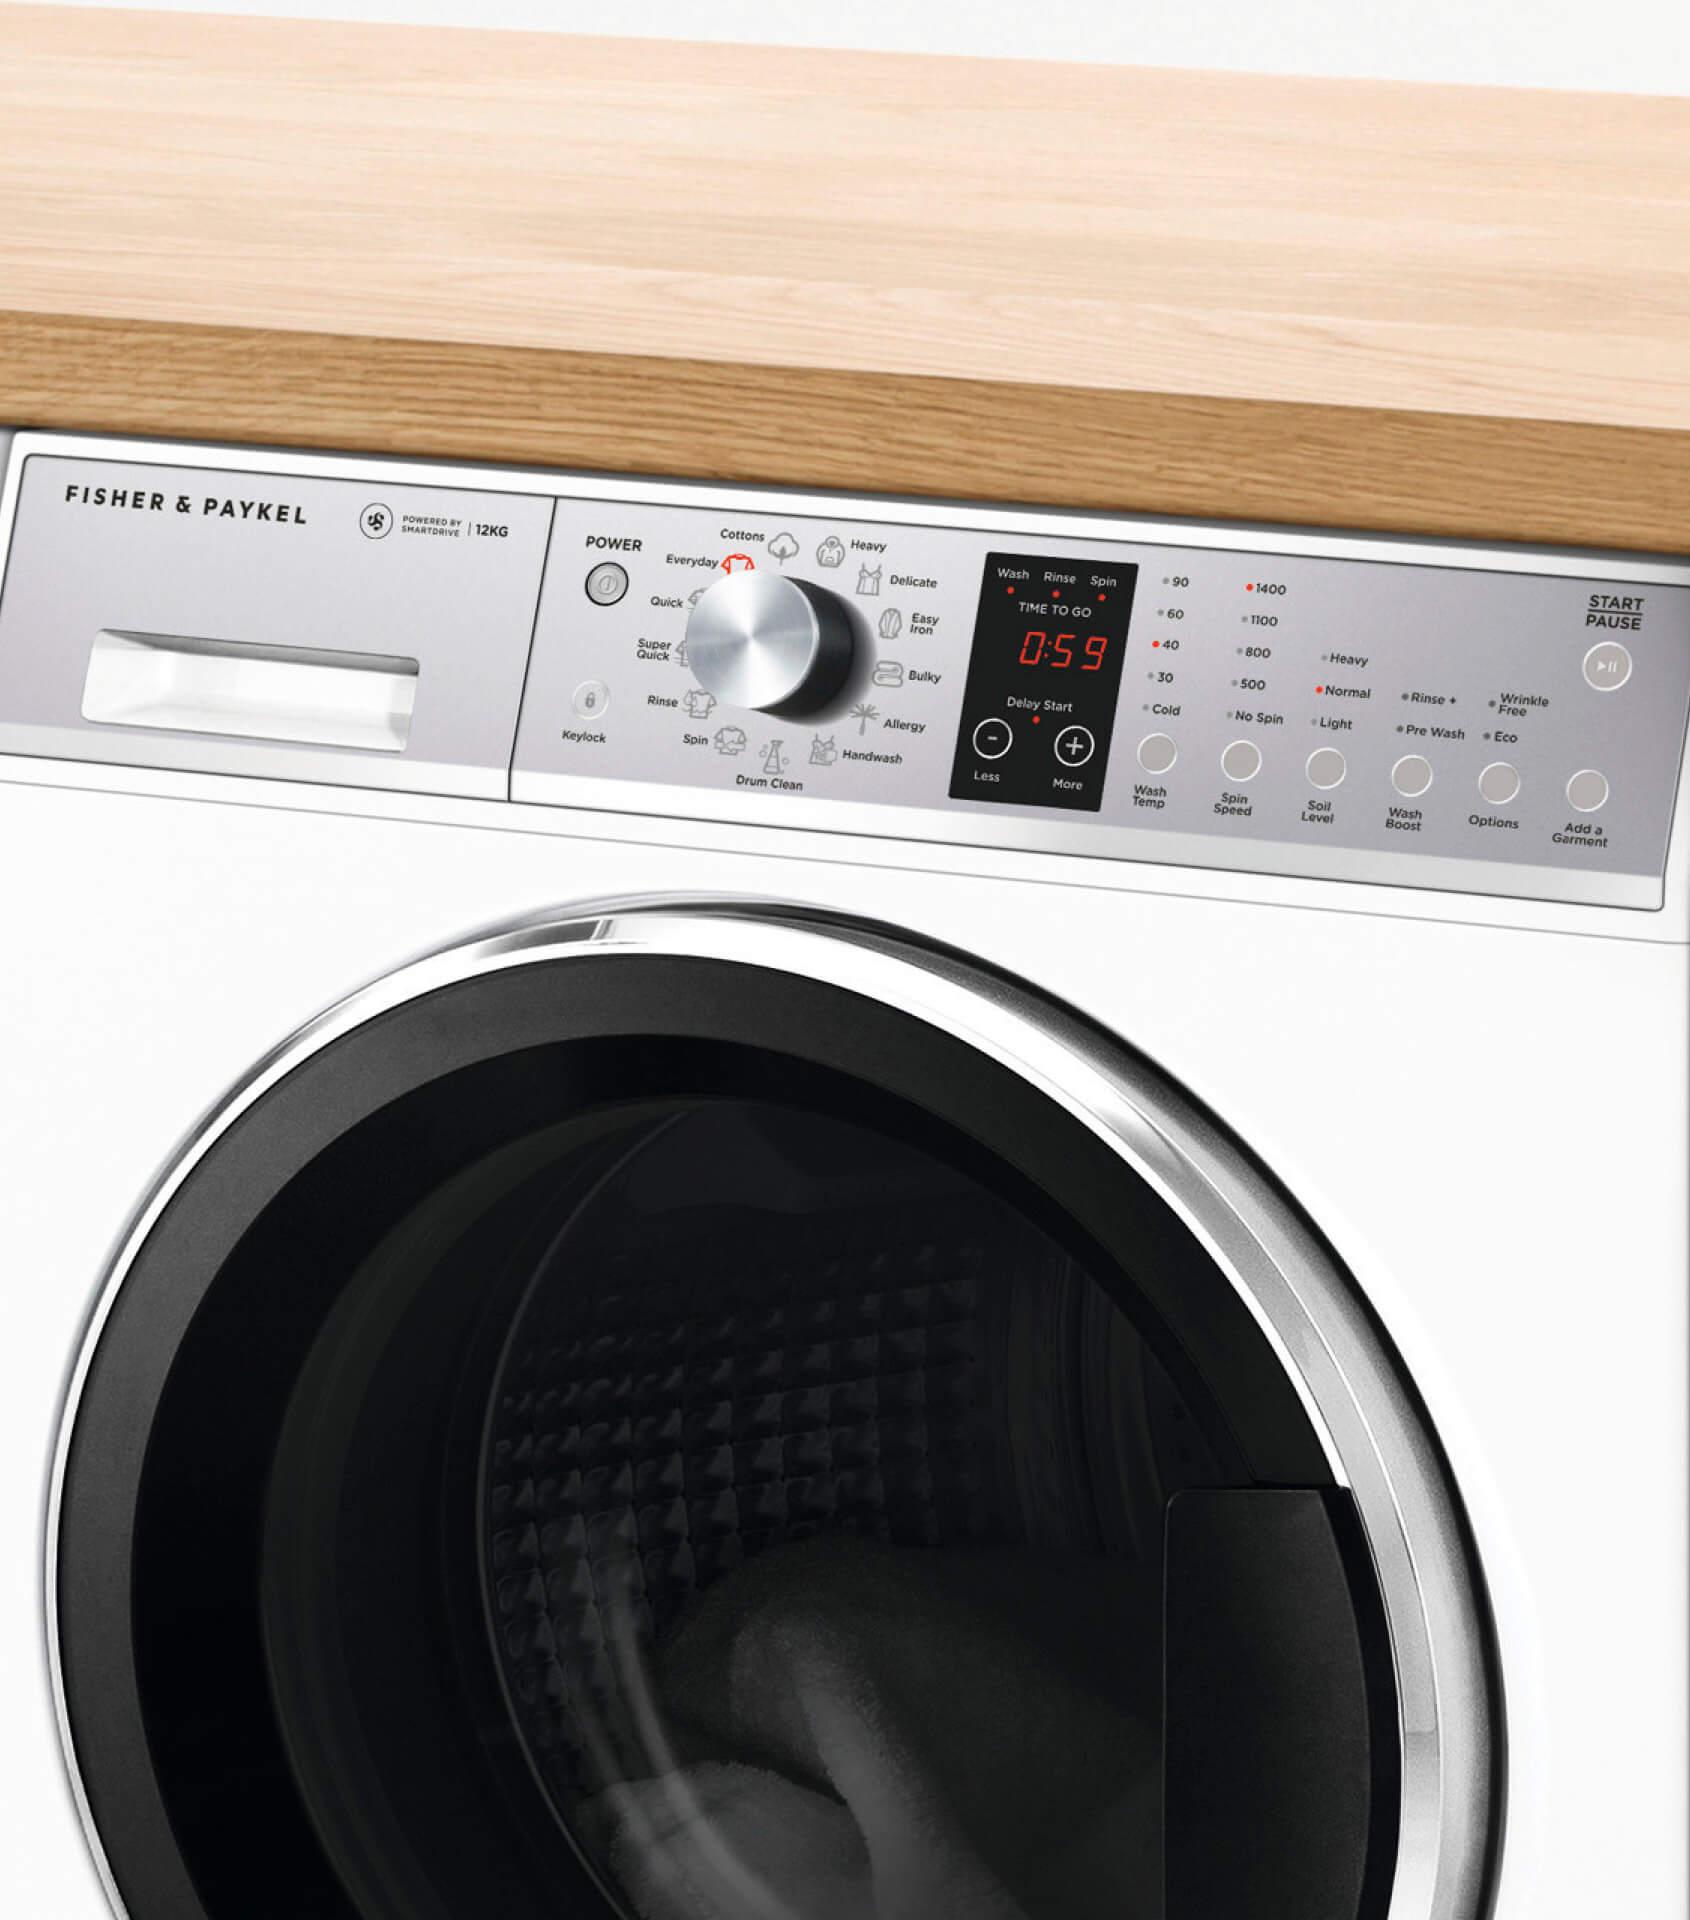 Wh1260p1 Front Loader Washing Machine 12kg Fisher